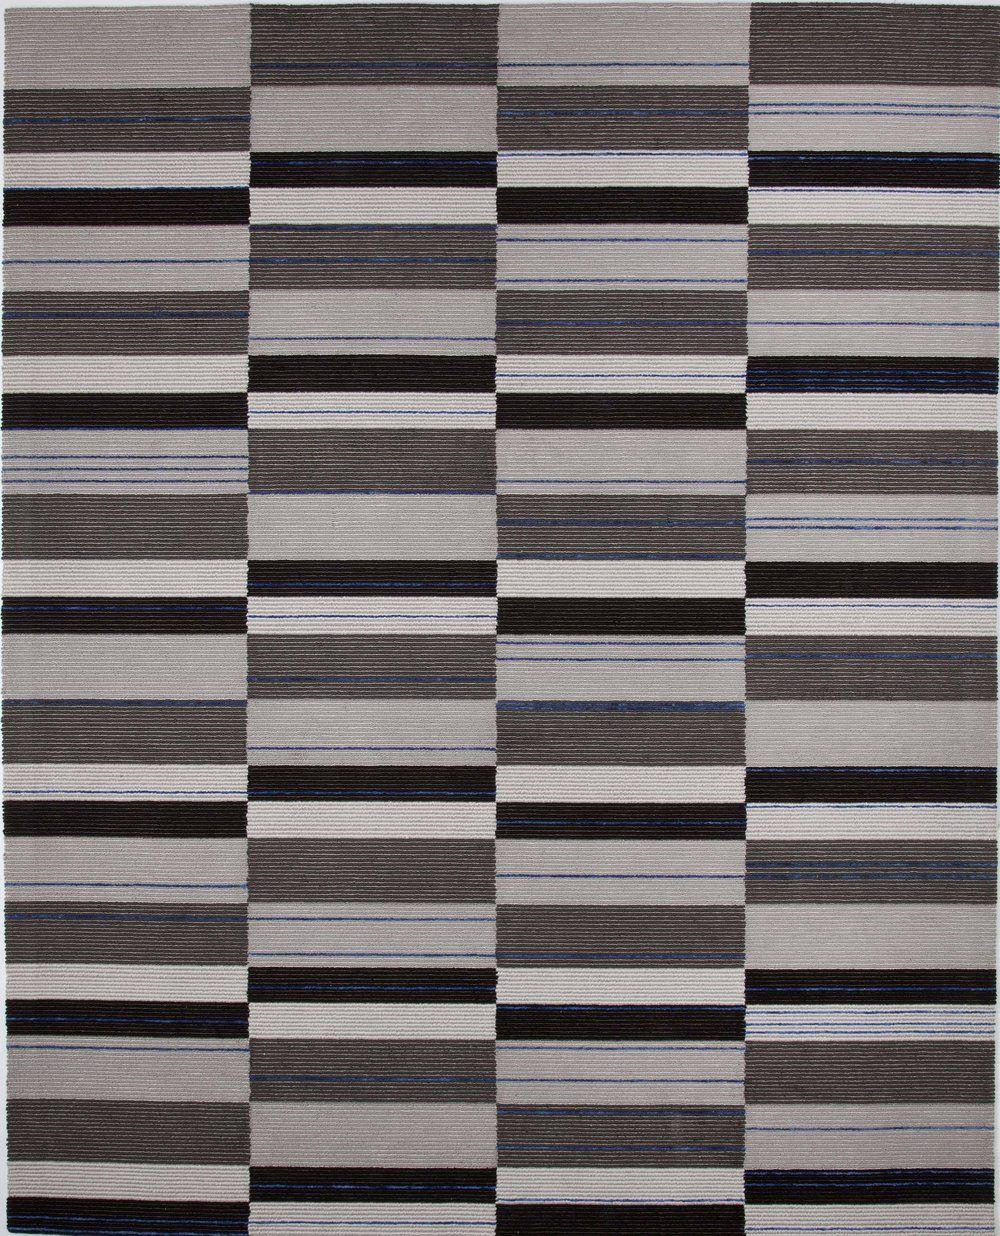 Texture Carrelage Moderne Frais Photographie Time I Rug S 1 1000—1236 Bed